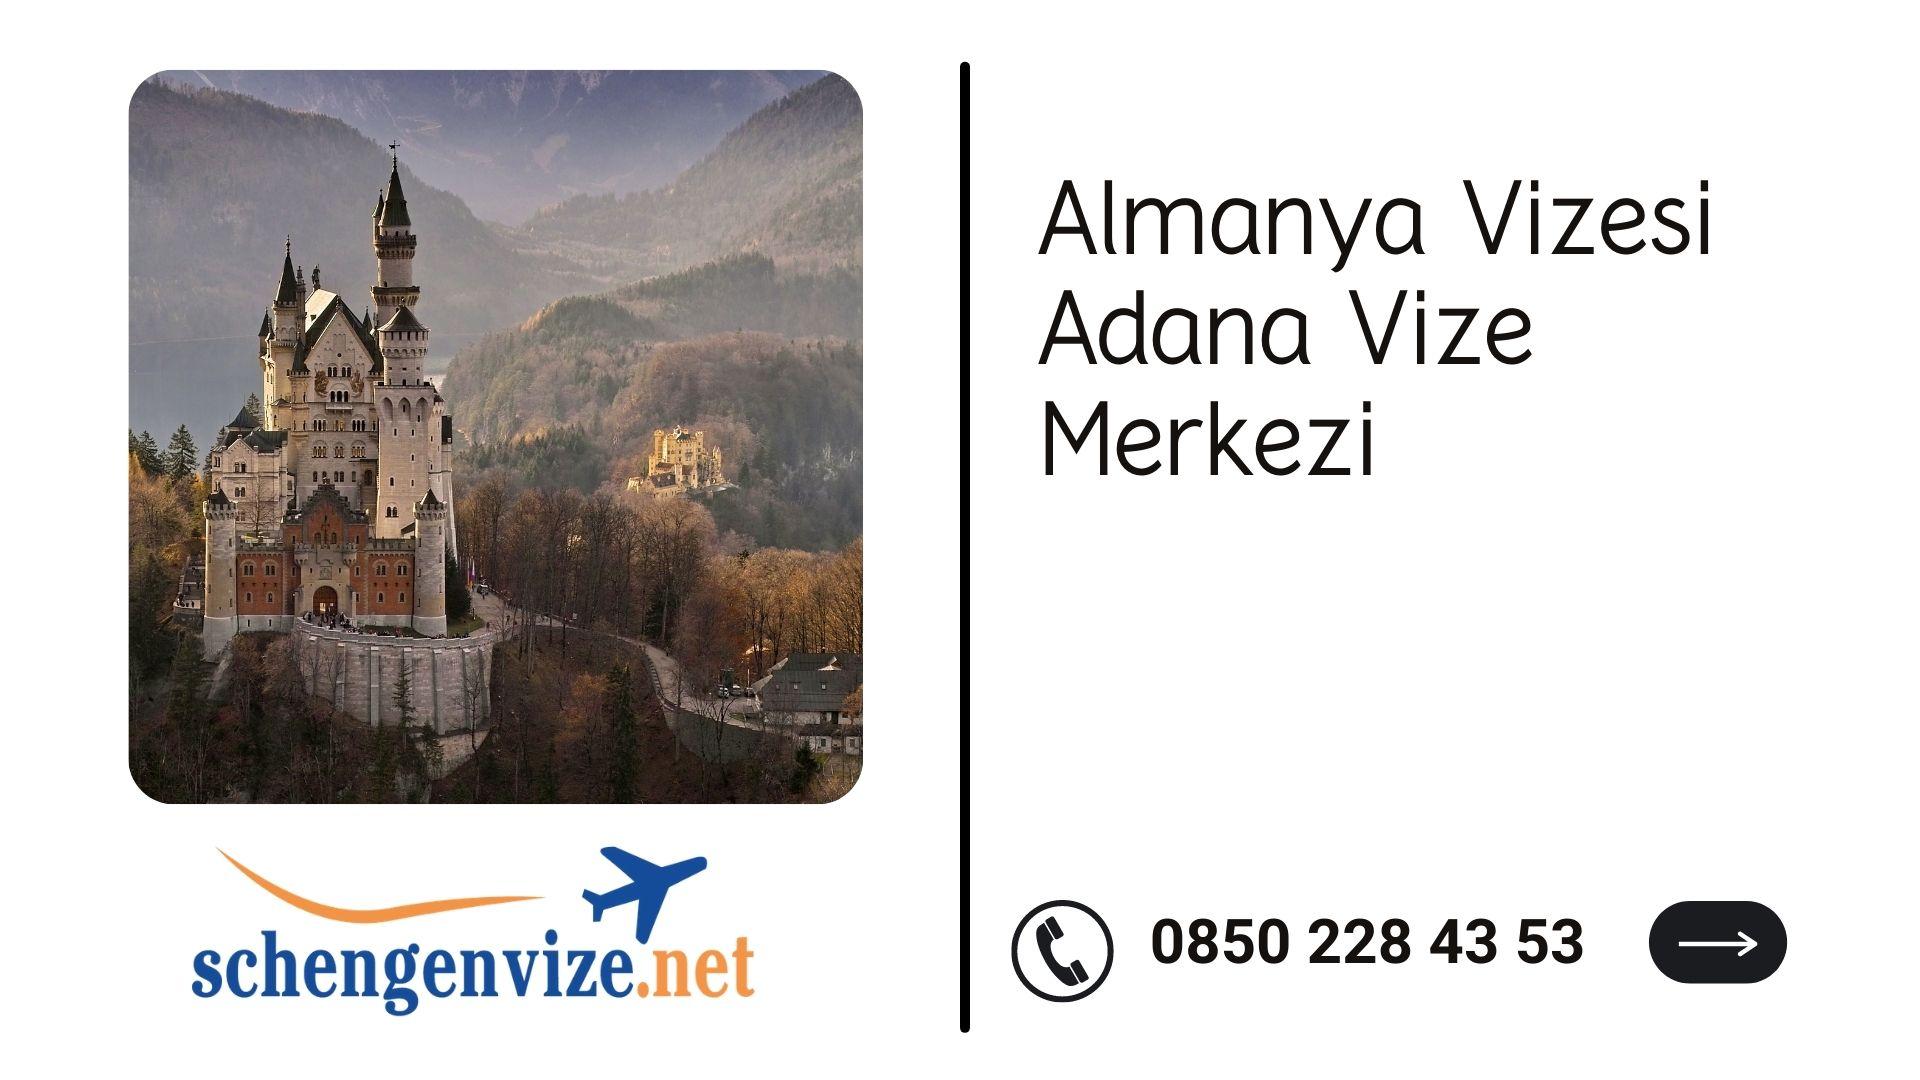 Almanya Vizesi Adana Vize Merkezi